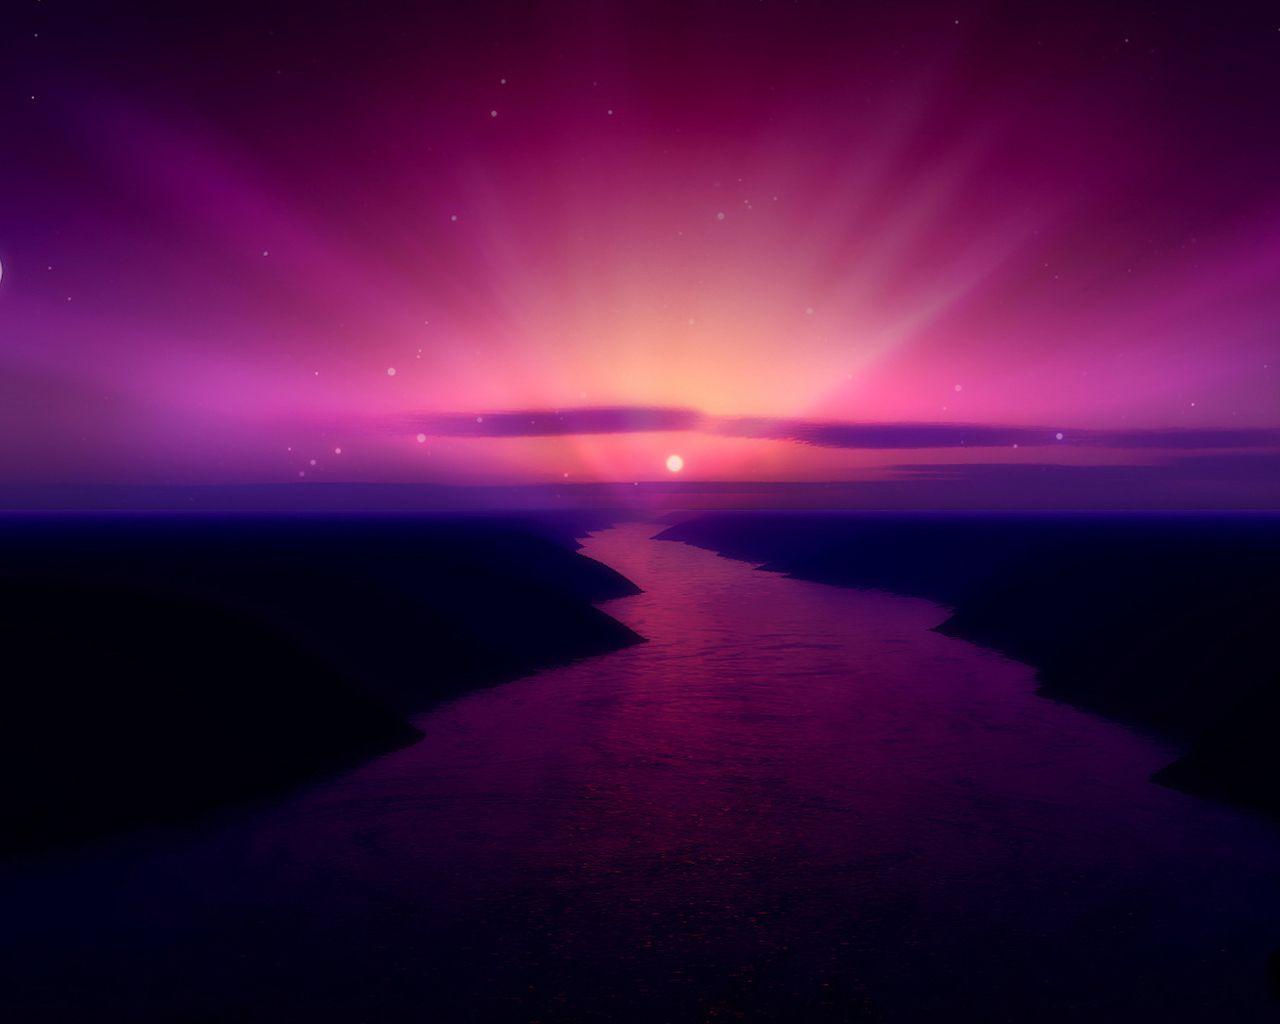 Purple Fantasy Landscape Wallpaper Desktop Background